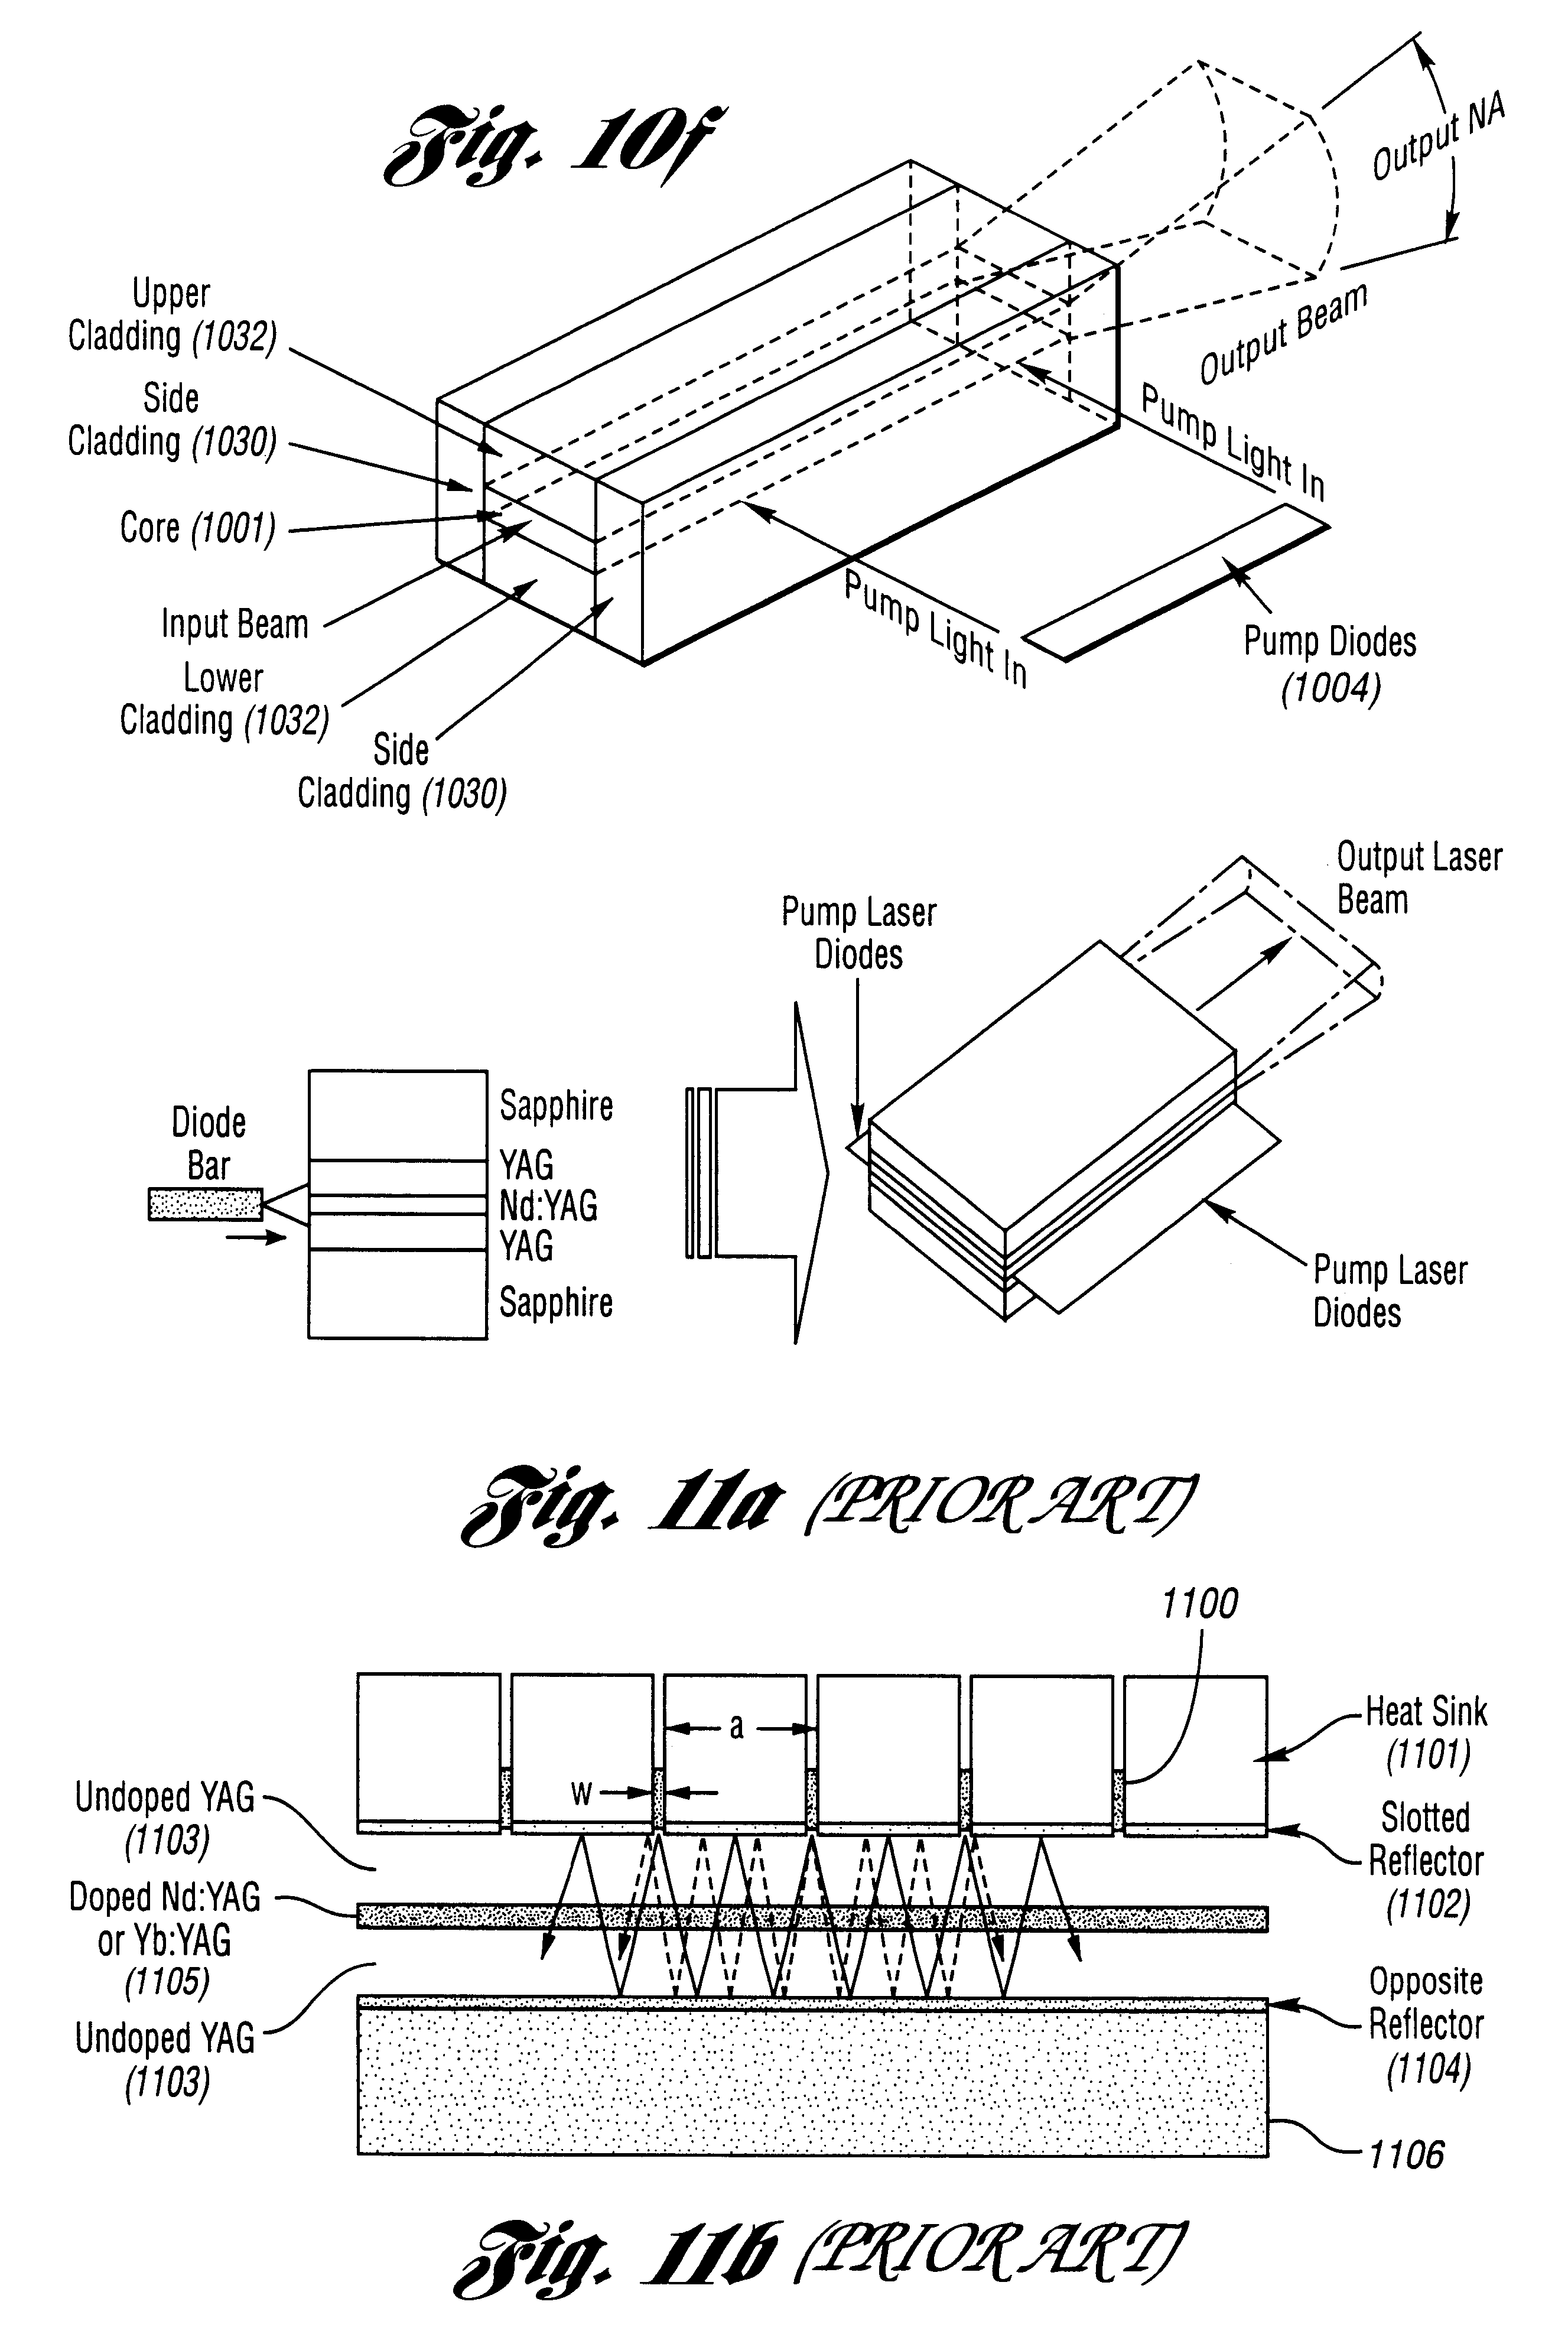 block diagram ndb online wiring diagram RF Transmitterfor Sale block diagram ndb circuit diagram imagesndb h wiring diagram databasendb h wiring diagram database ndb h